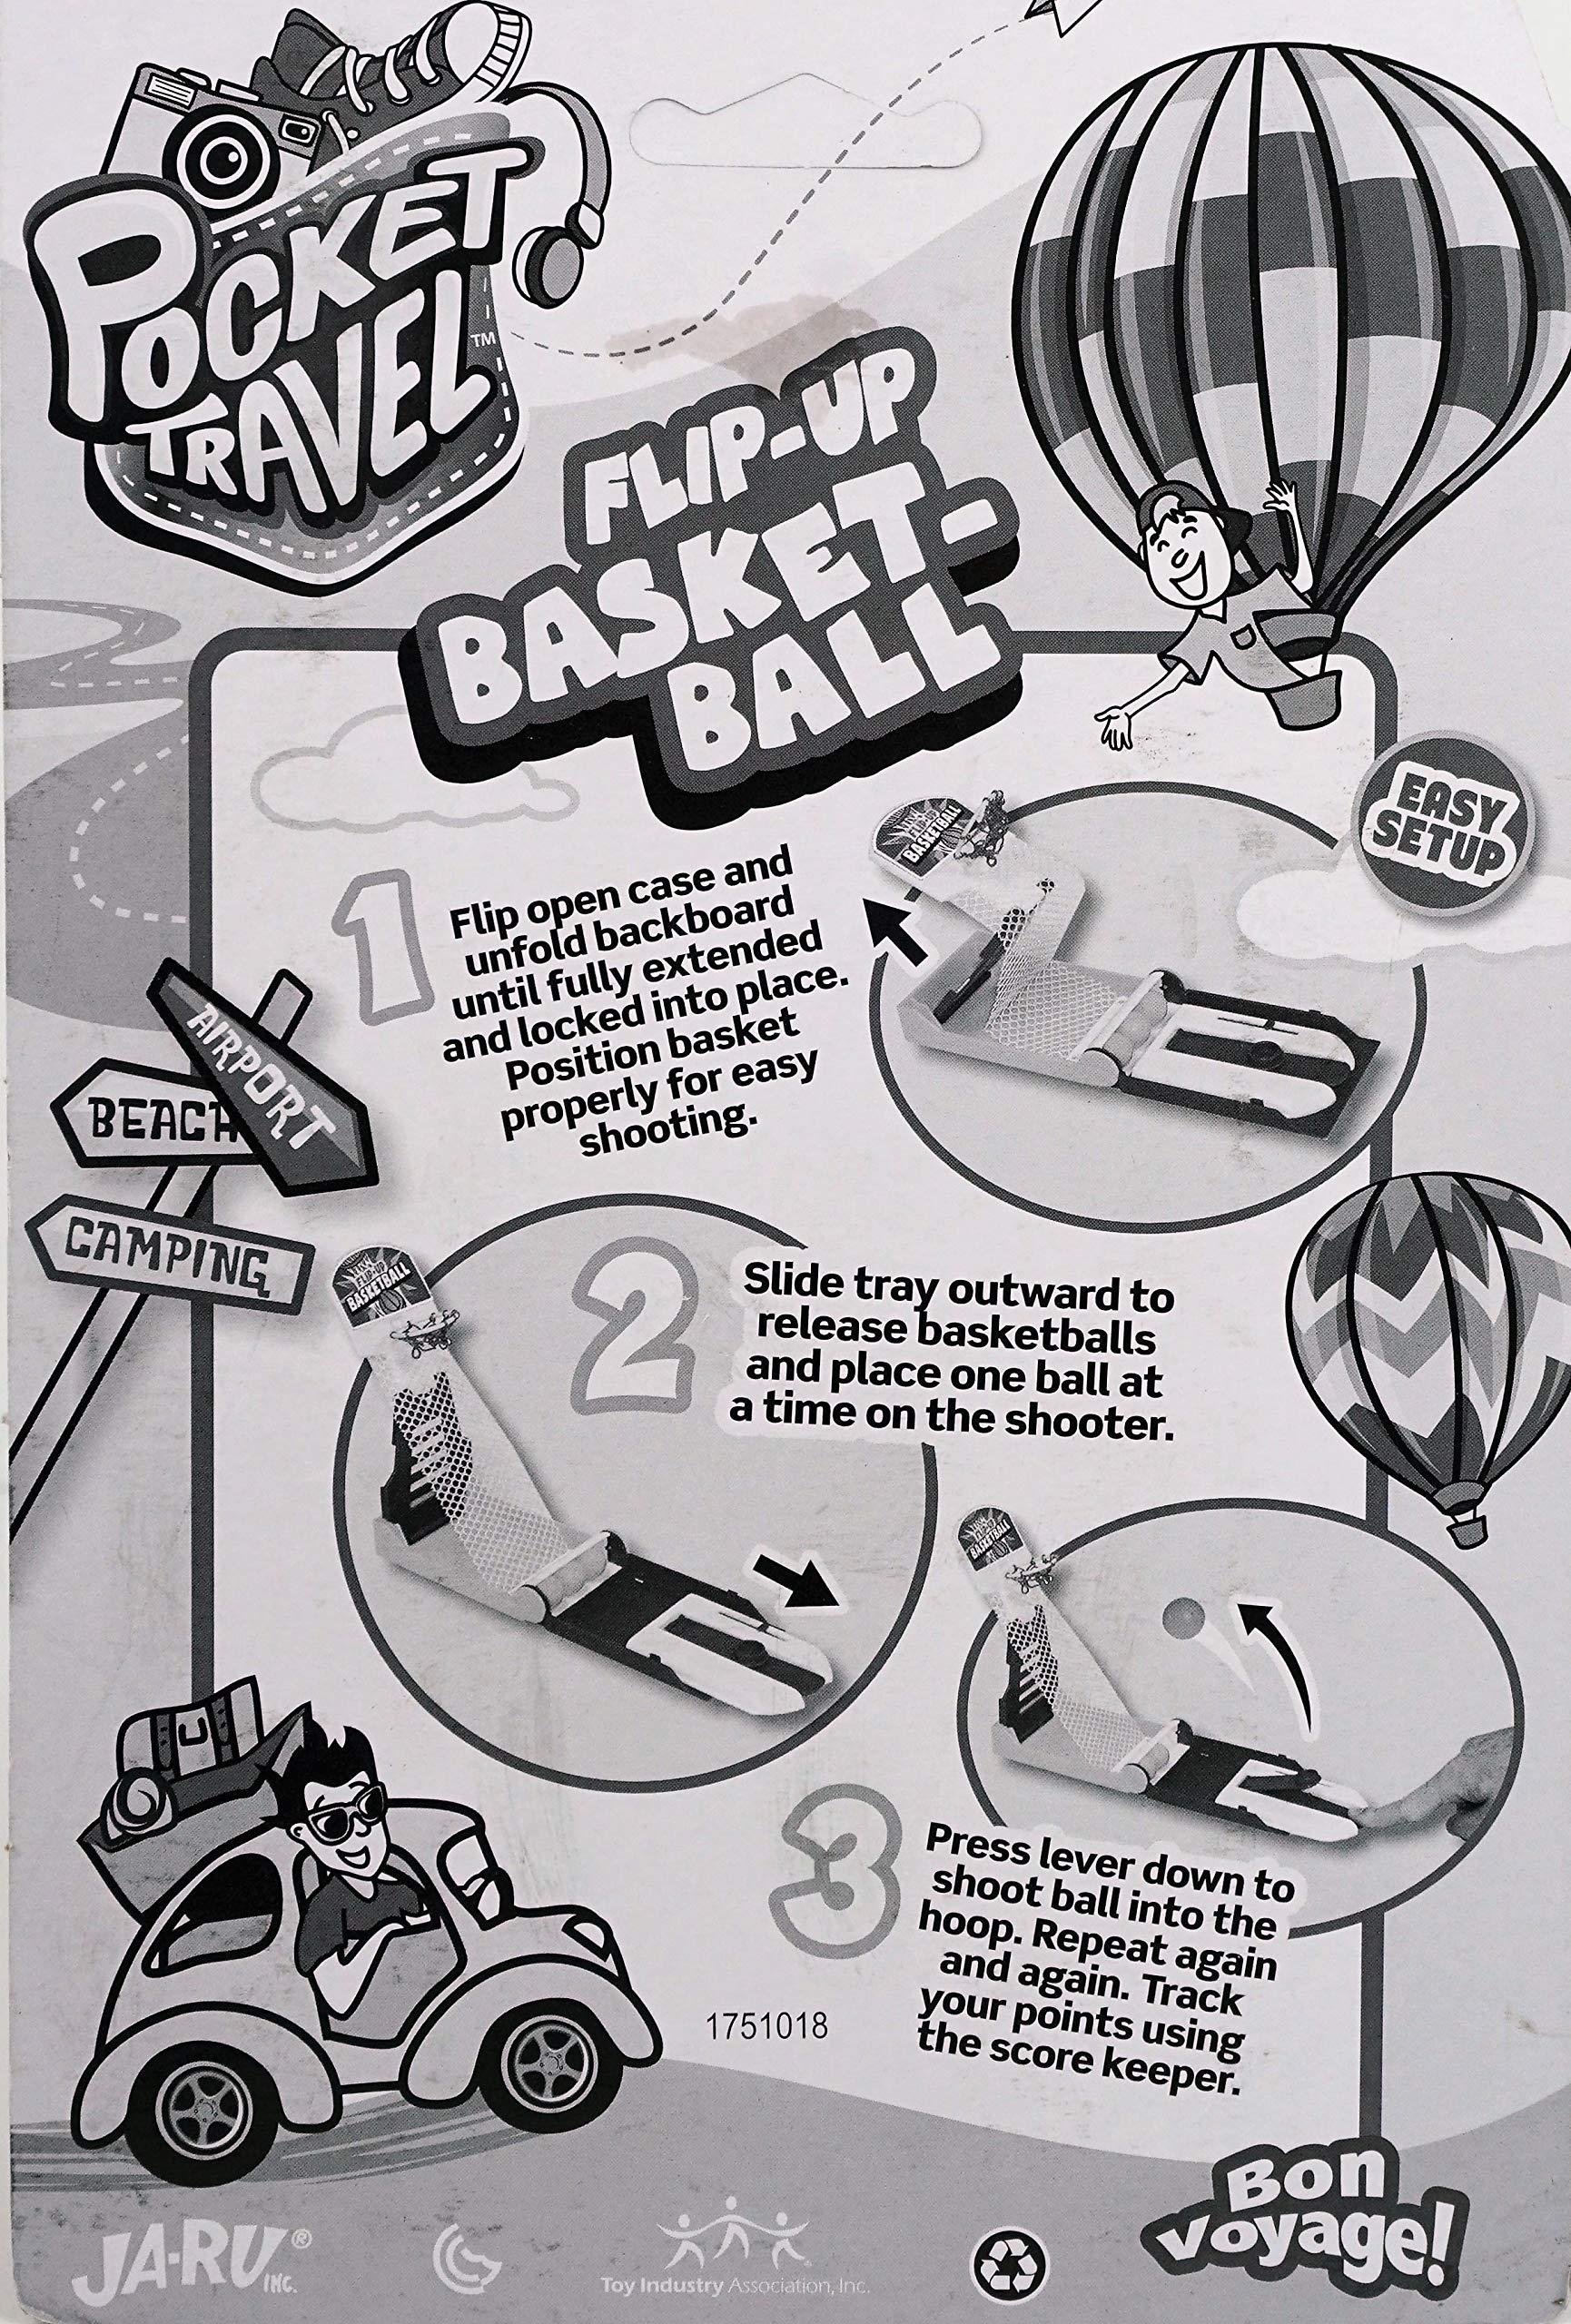 JA-RU Basketball Pocket Travel Game (144 Units) and one Bouncy Ball Item #3255-144p by JA-RU (Image #5)